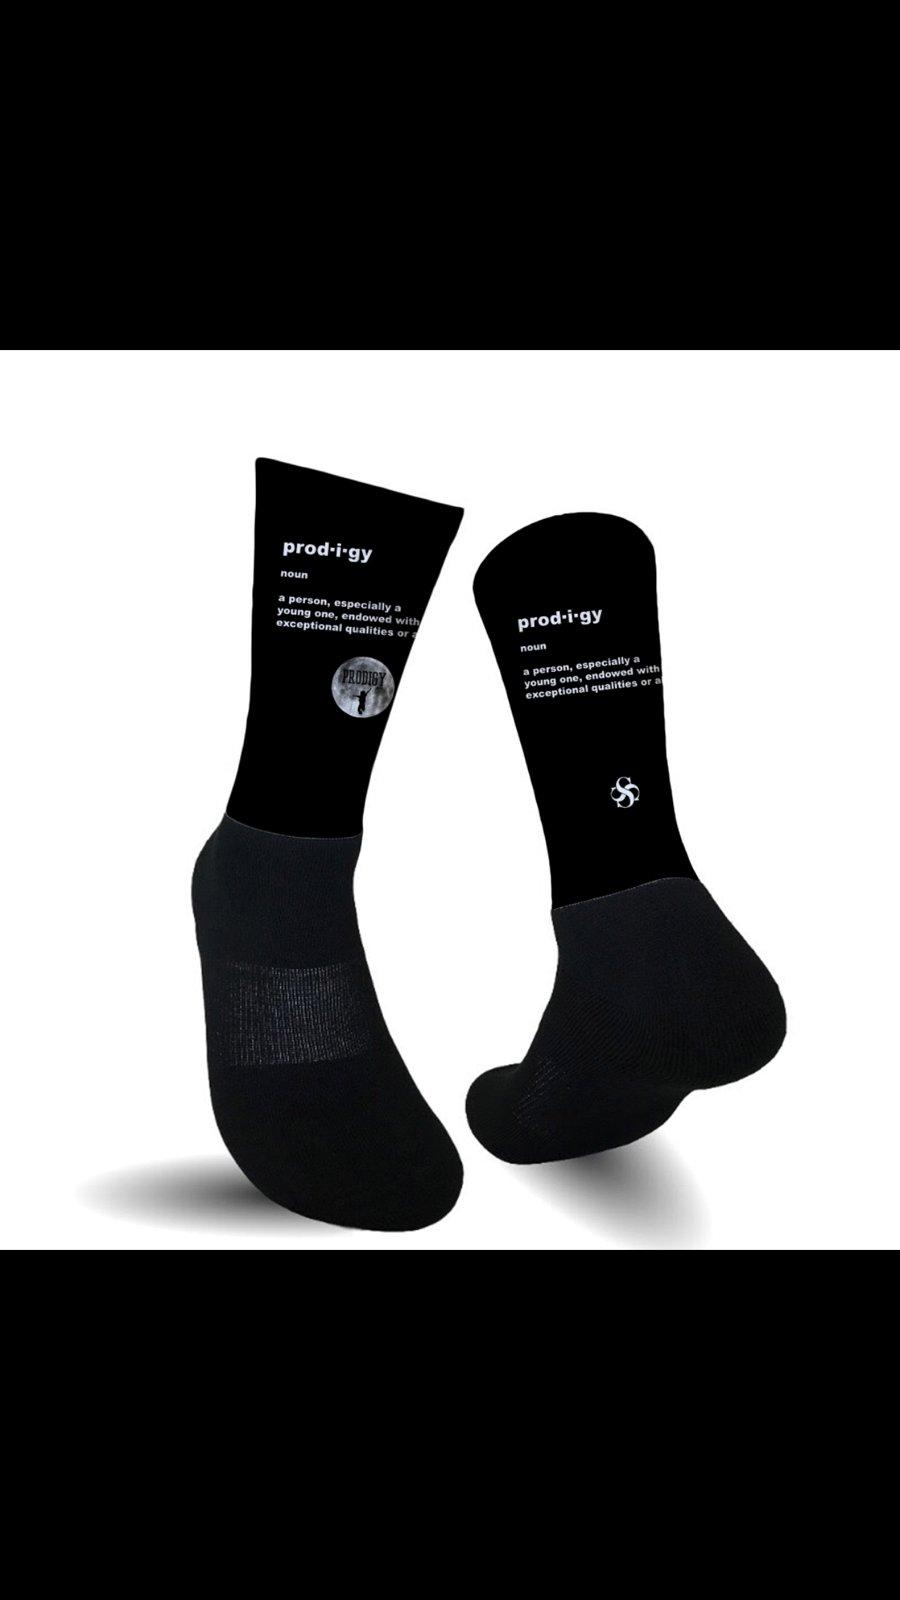 Prodigy Definition Socks Black with Logo